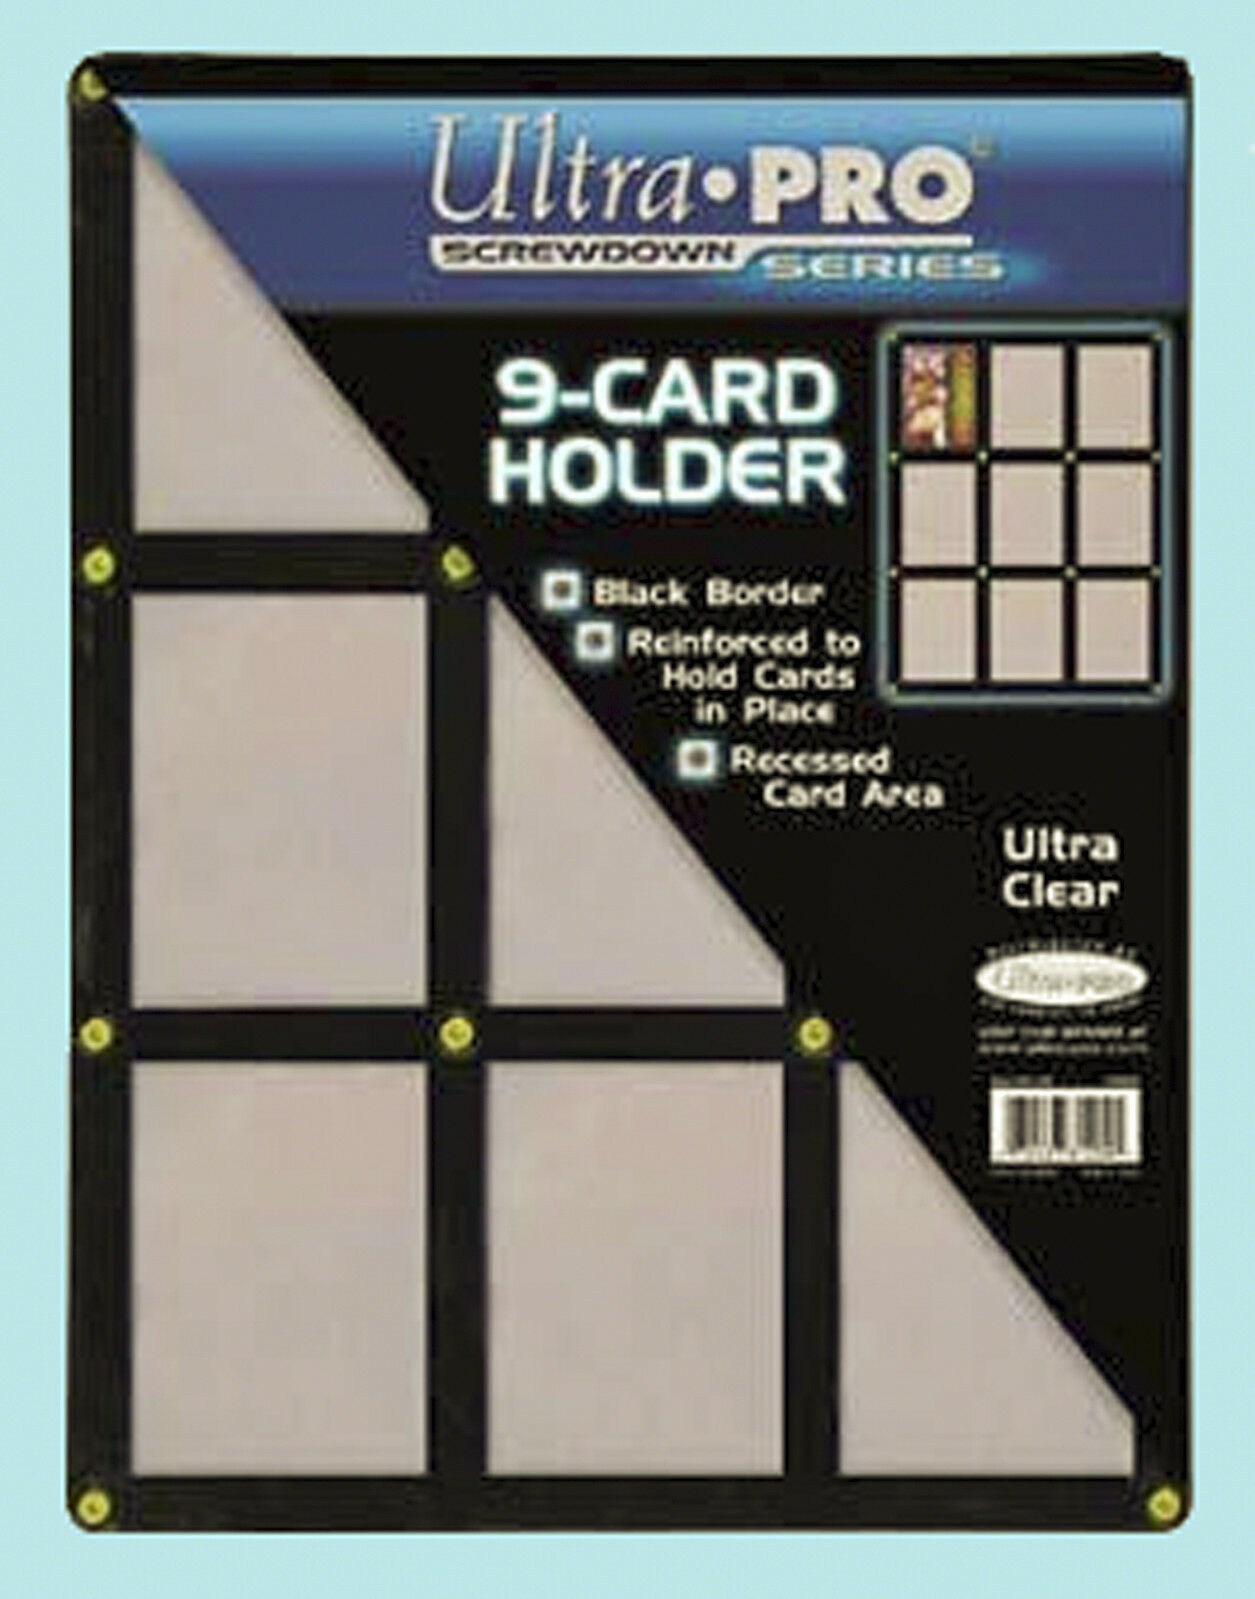 ultra pro screwdown storage display supplies